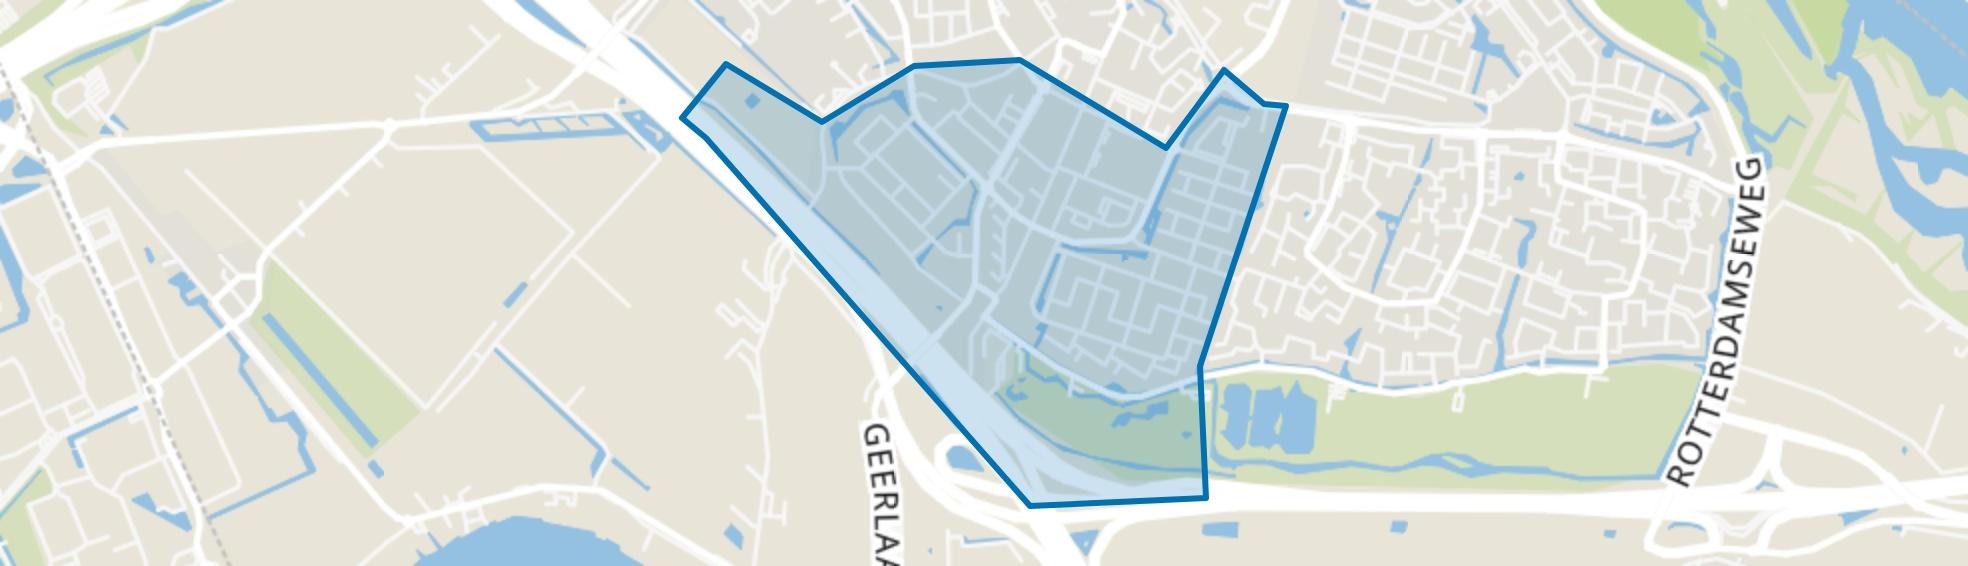 Oost, Ridderkerk map